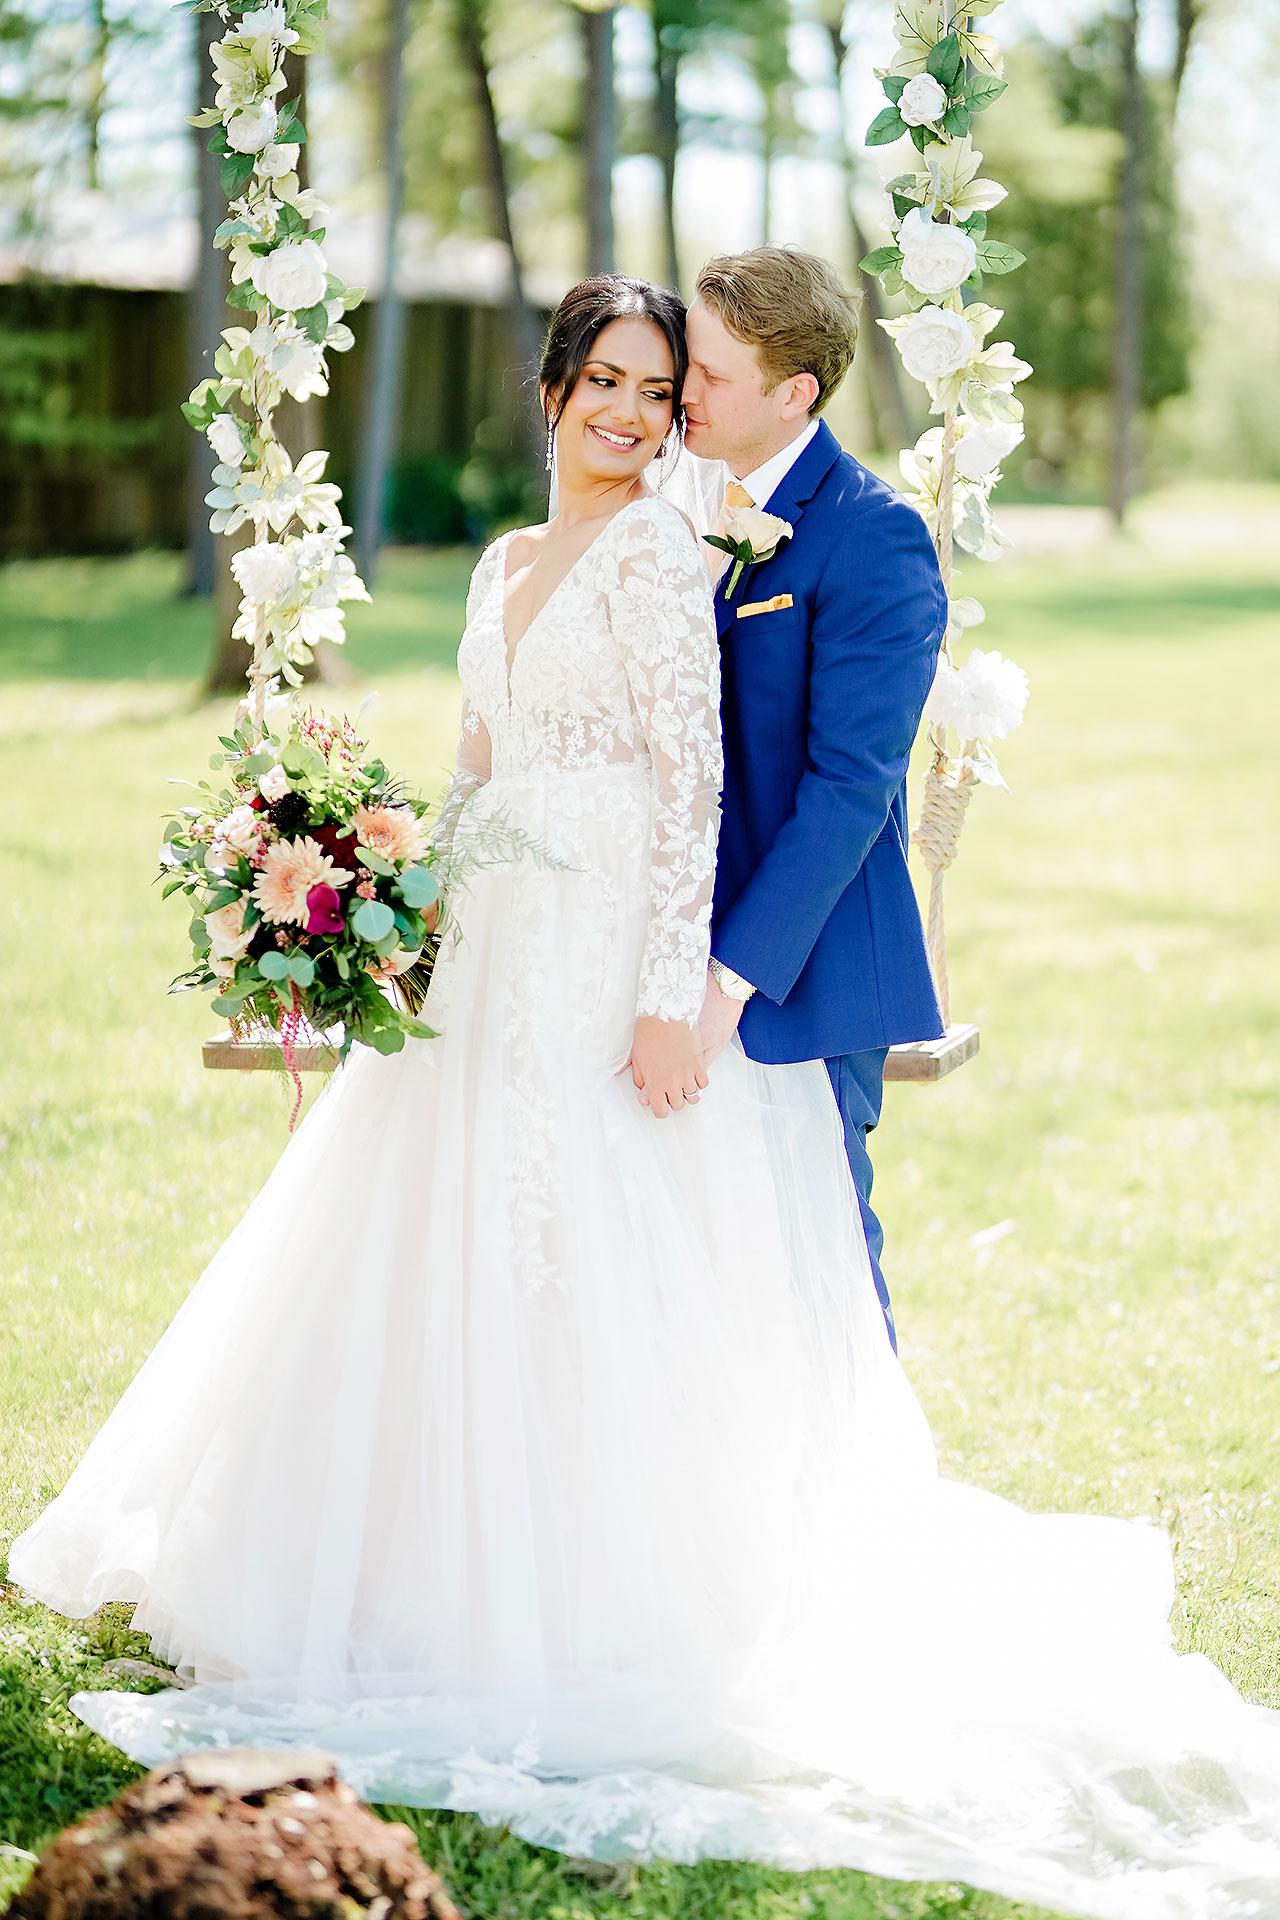 Nadia Parker Black Iris Estate Carmel Indiana Wedding May 2021 071